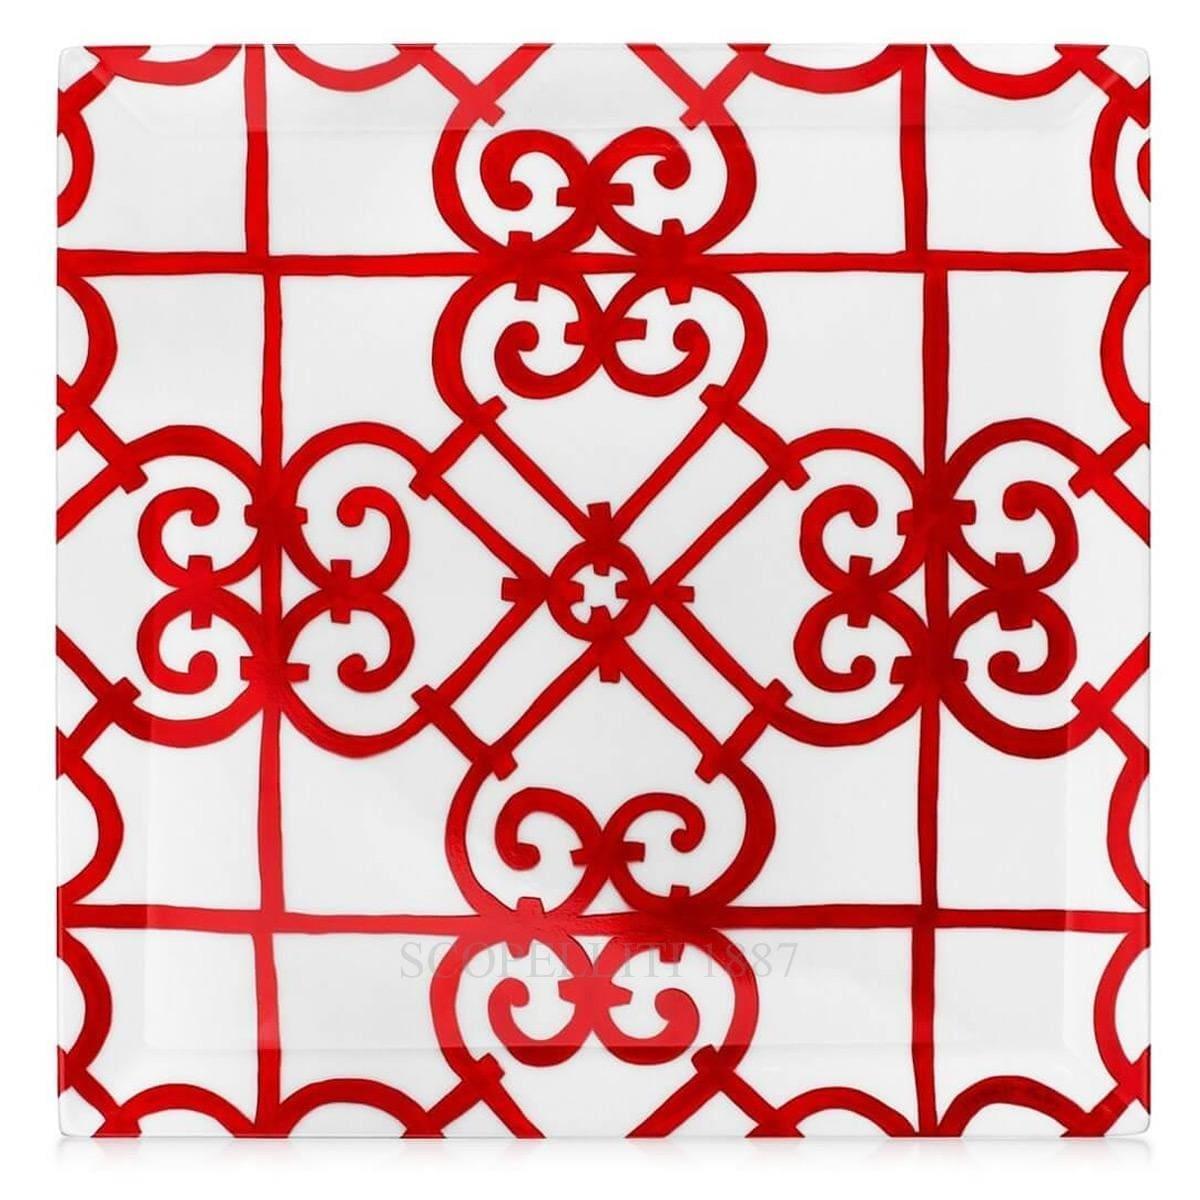 hermes parisbalcon du guadalquivir designer porcelain square plate